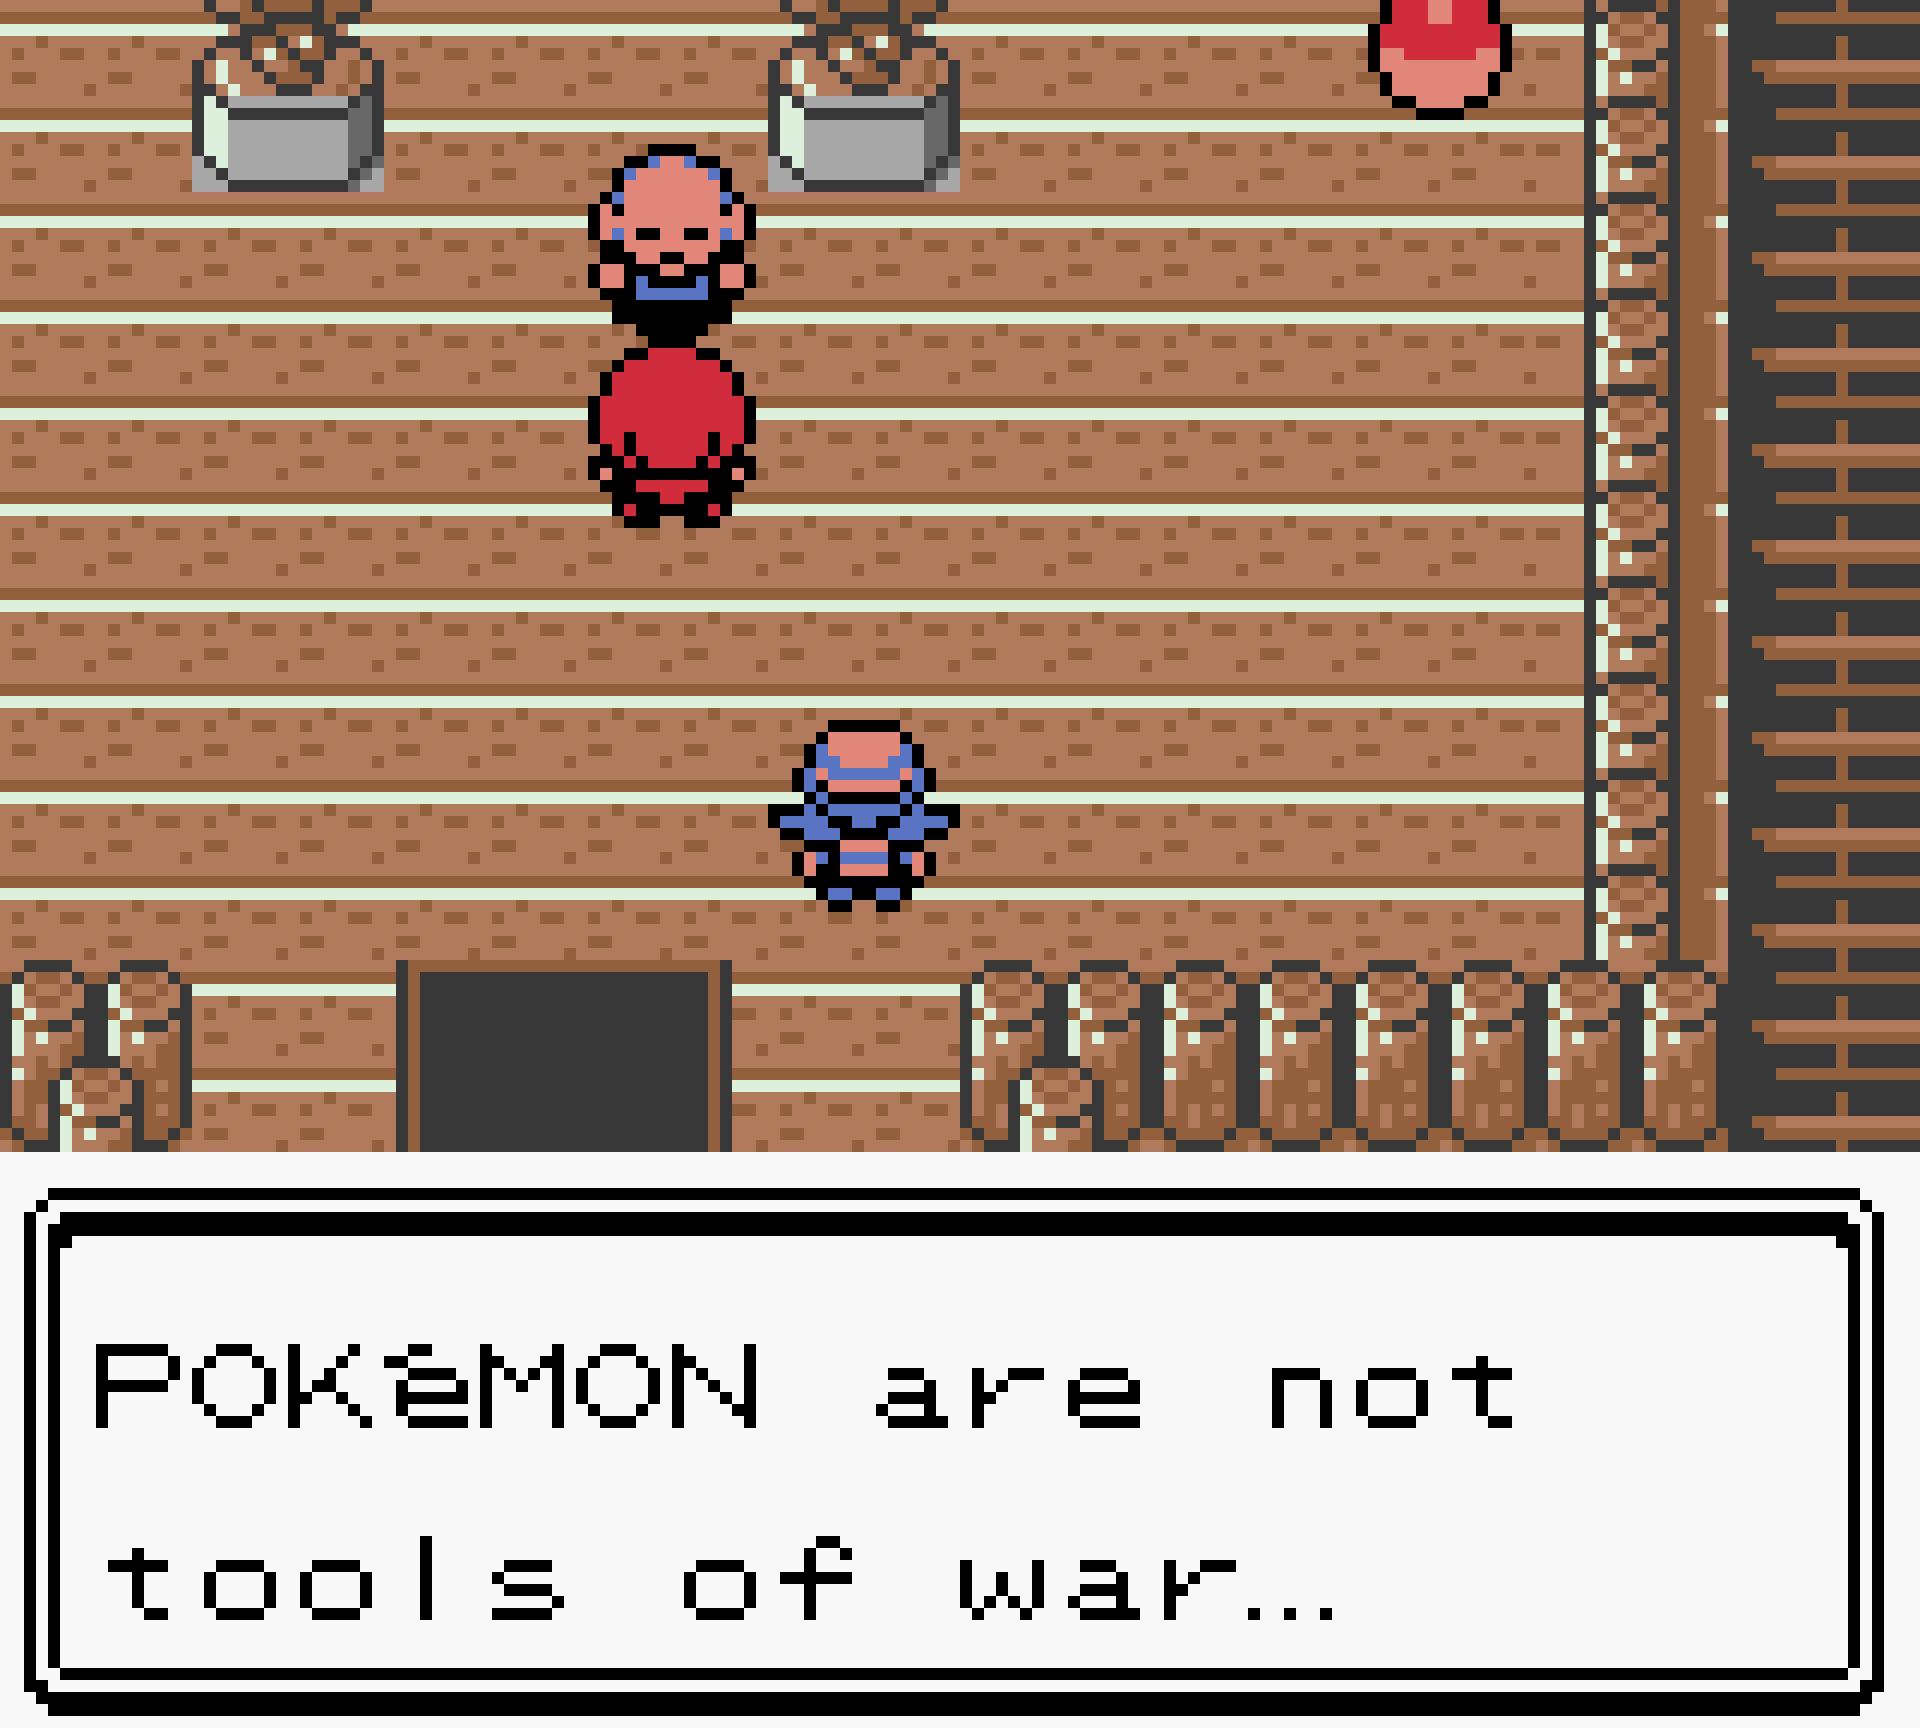 Pokemon_Crystal_Nuzlocke_2021-10-14_19.53.46.png